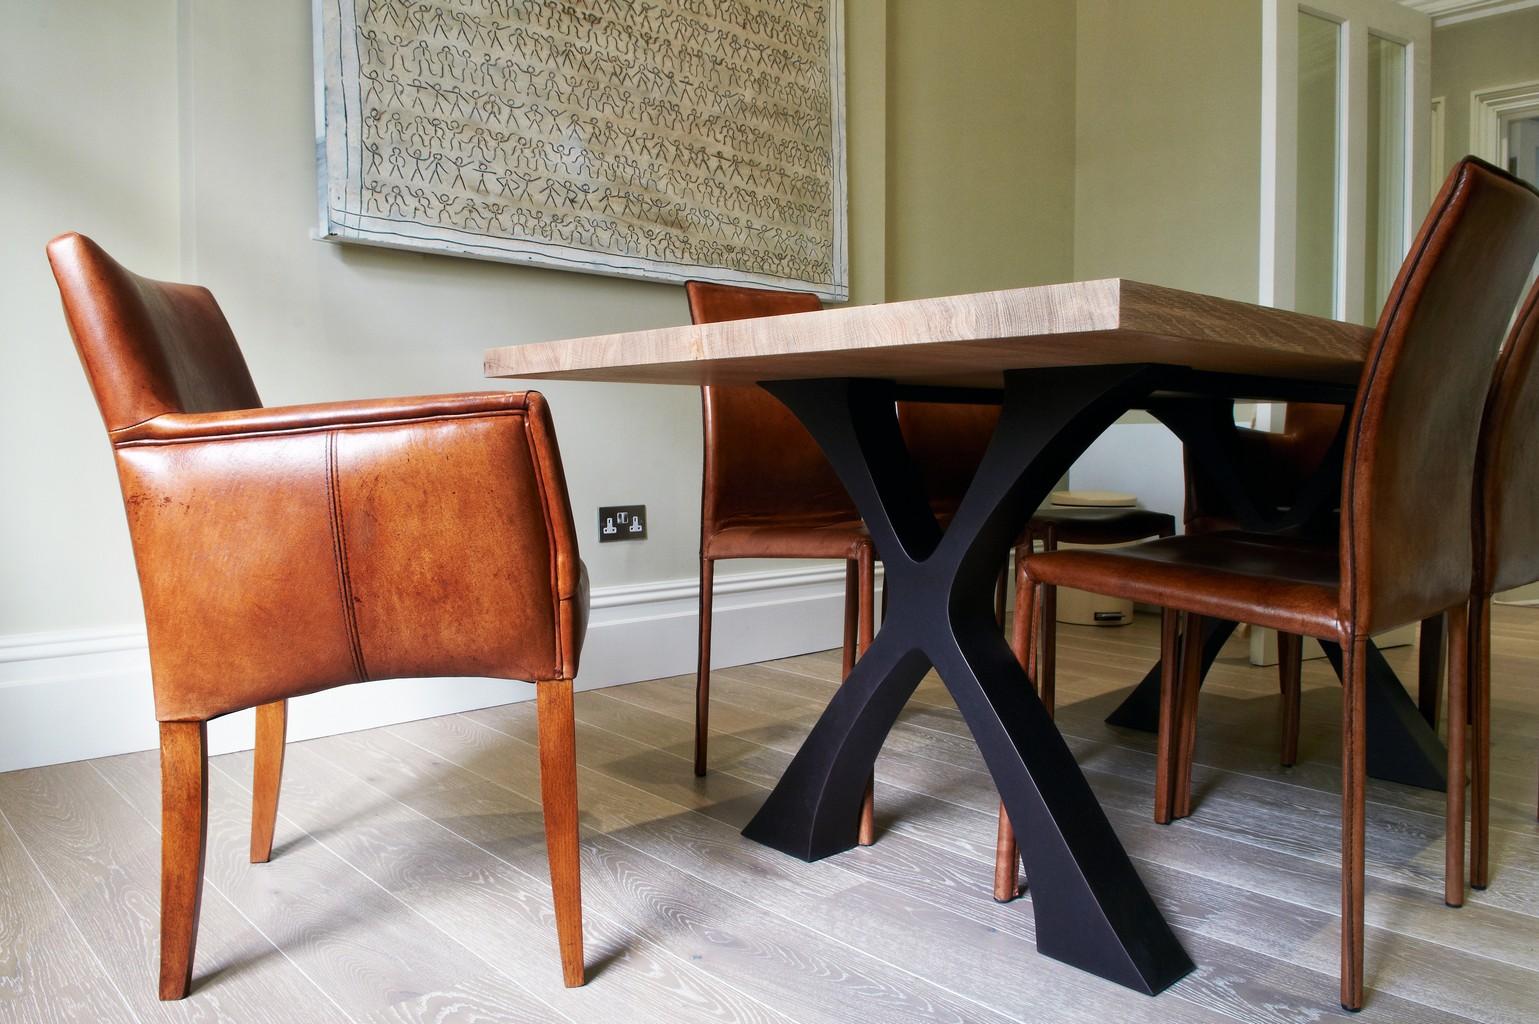 white washed oak plank wood flooring under modern table